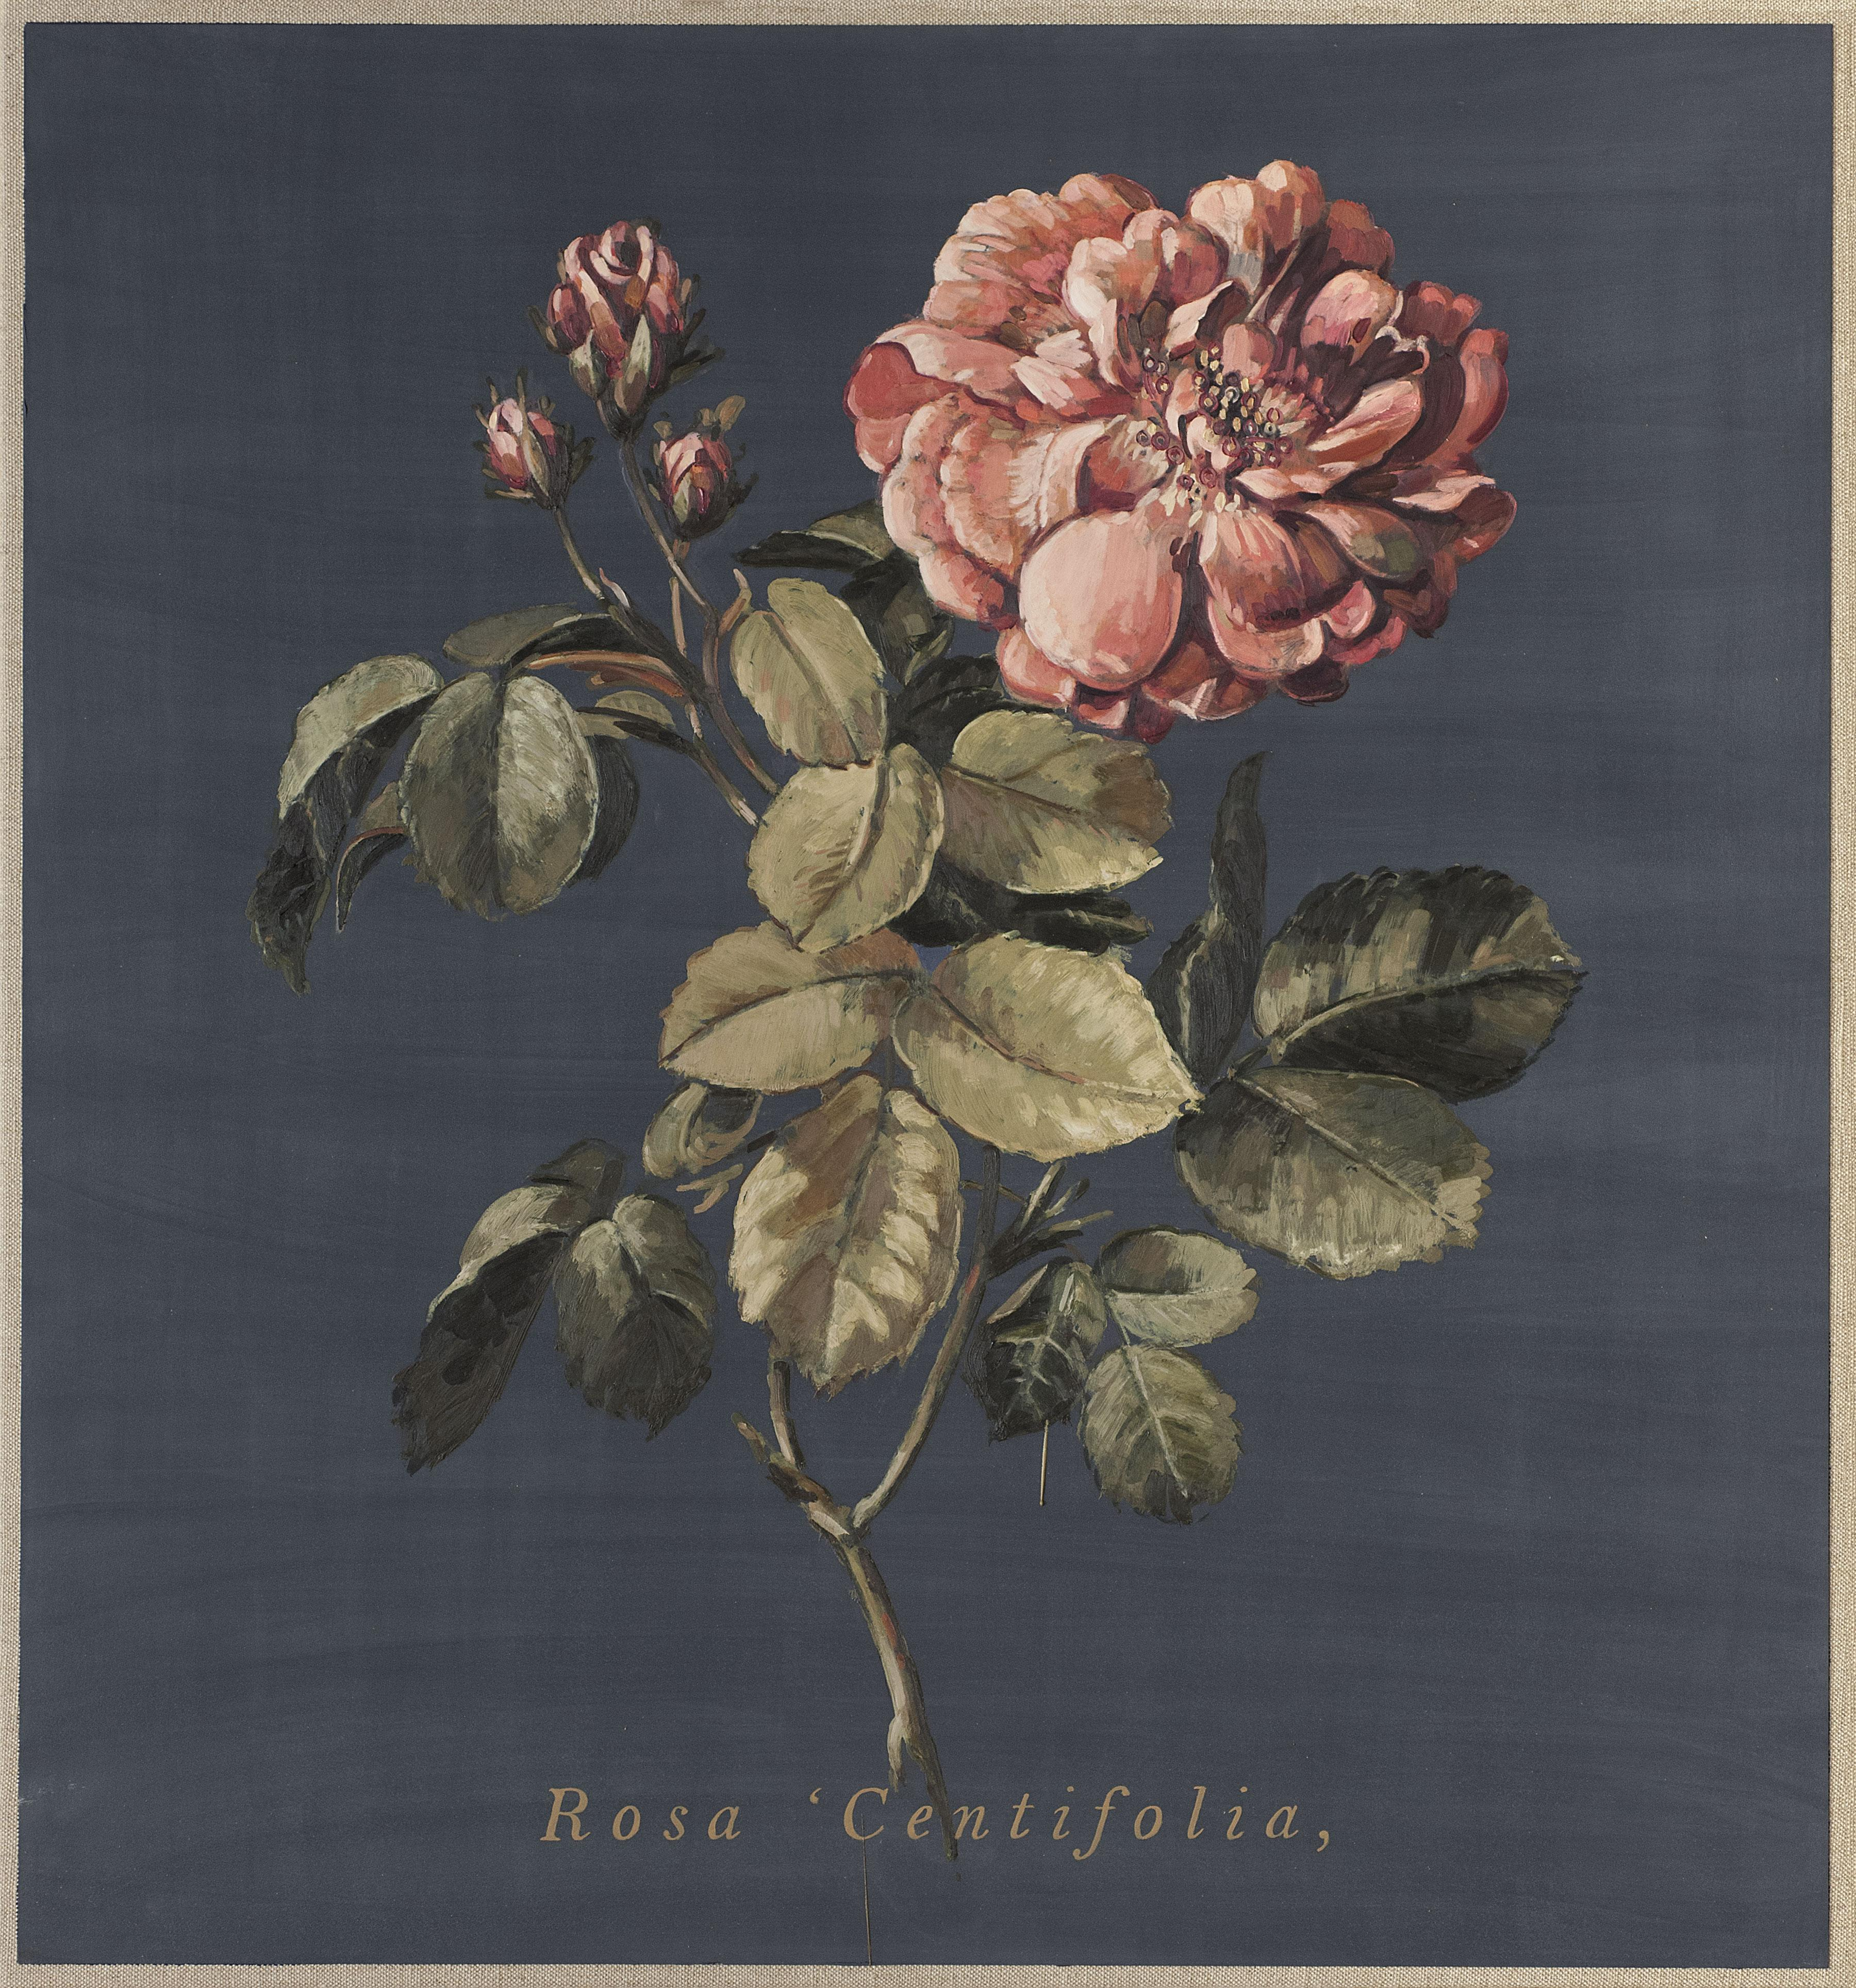 Rosa Centifolia (1ère interpretation)